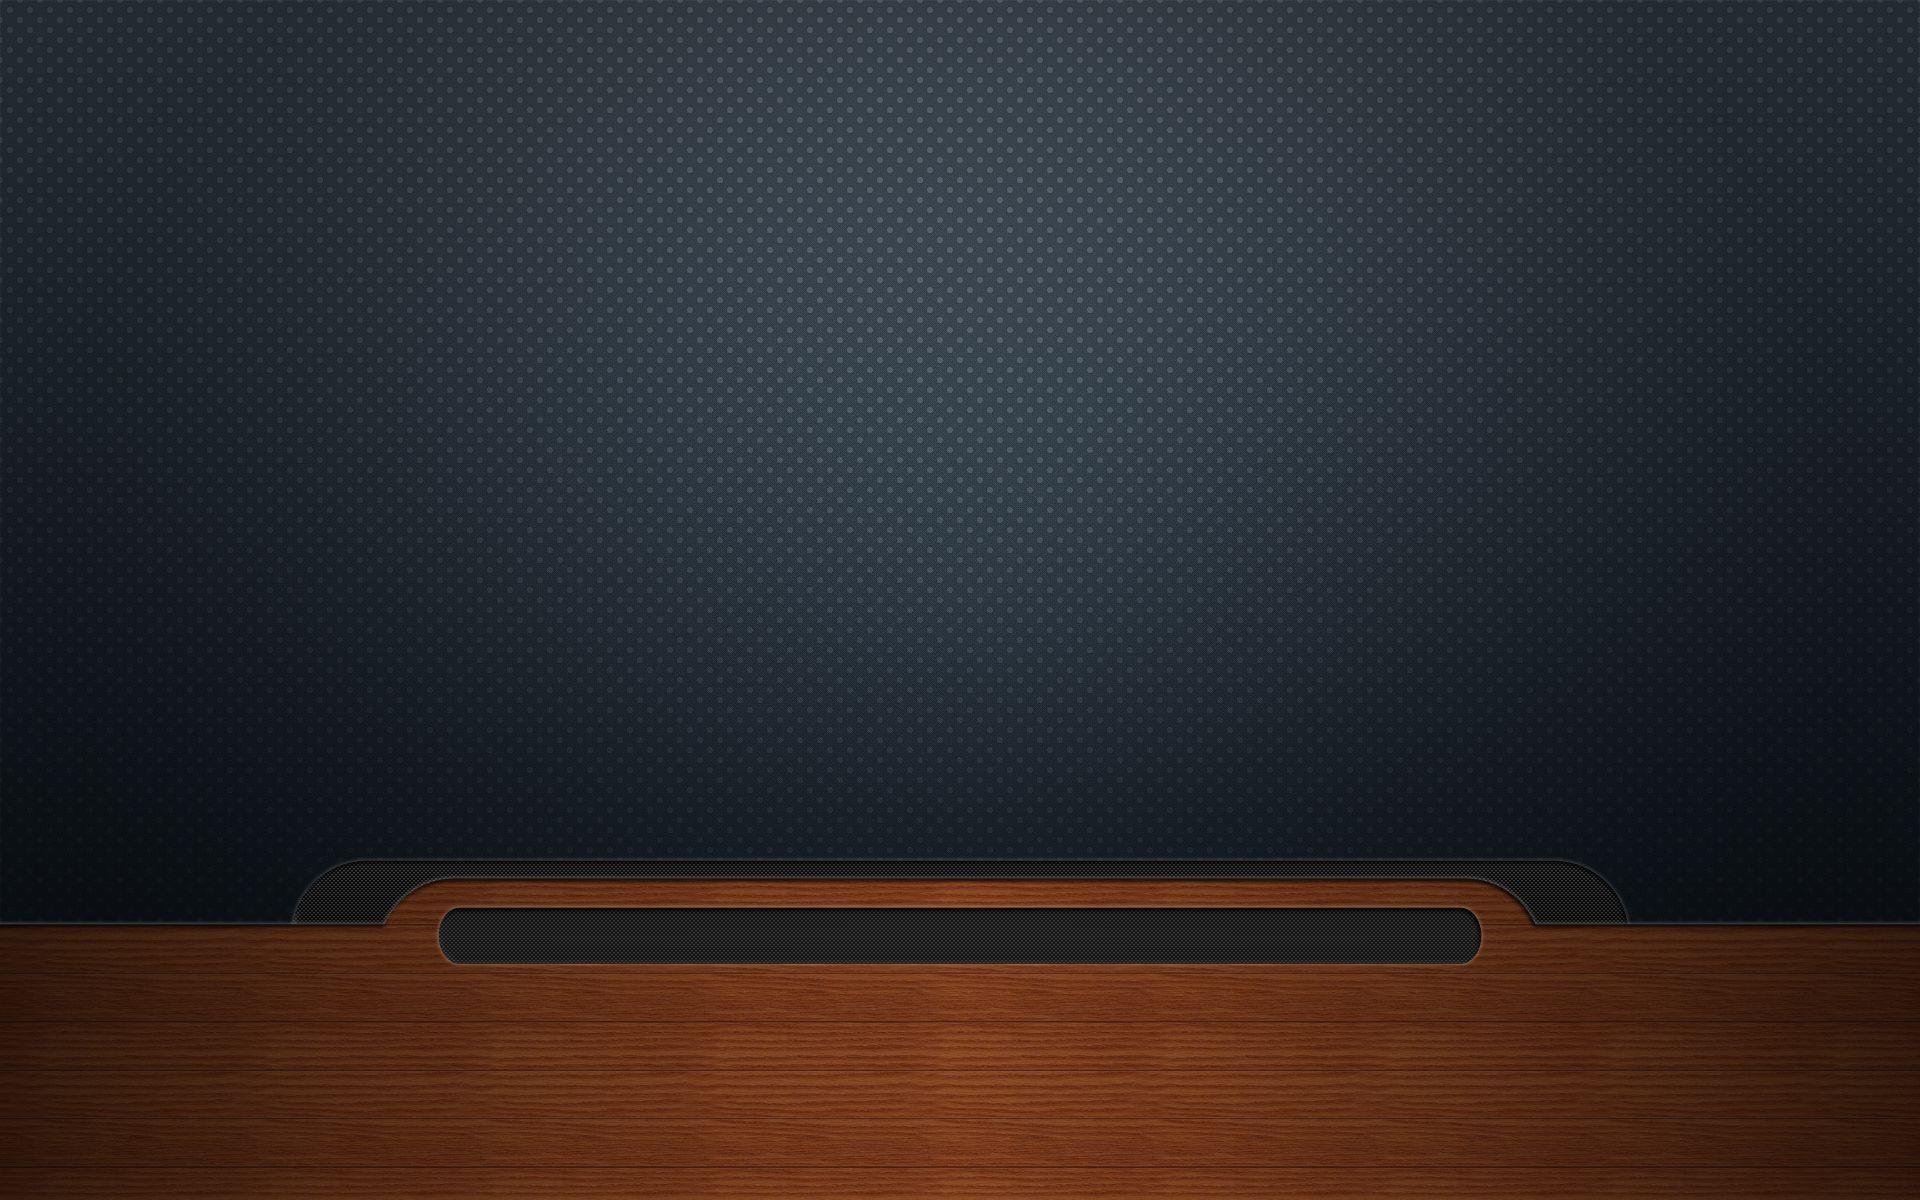 Res: 1920x1200, 274 Polka dot pattern and Polka Wallpapers - Full HD wallpaper search